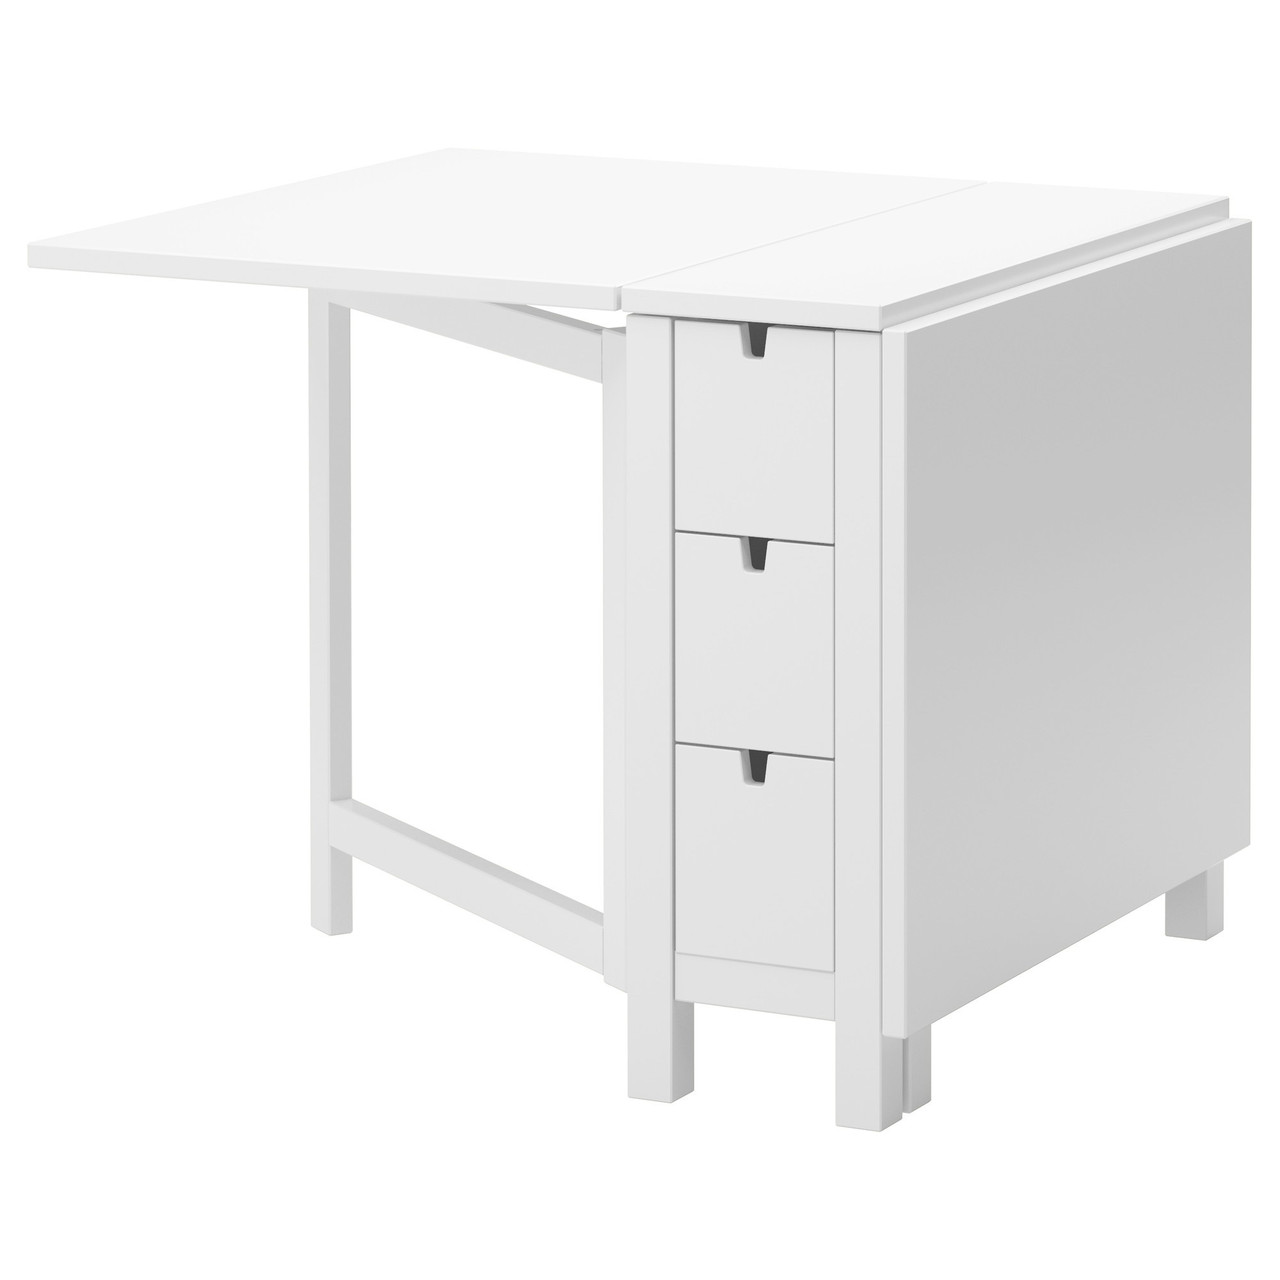 IKEA, NORDEN, Стол складной, белый, 26/89/152x80 см (104.238.86)(S10423886) НОРДЕН ИКЕА